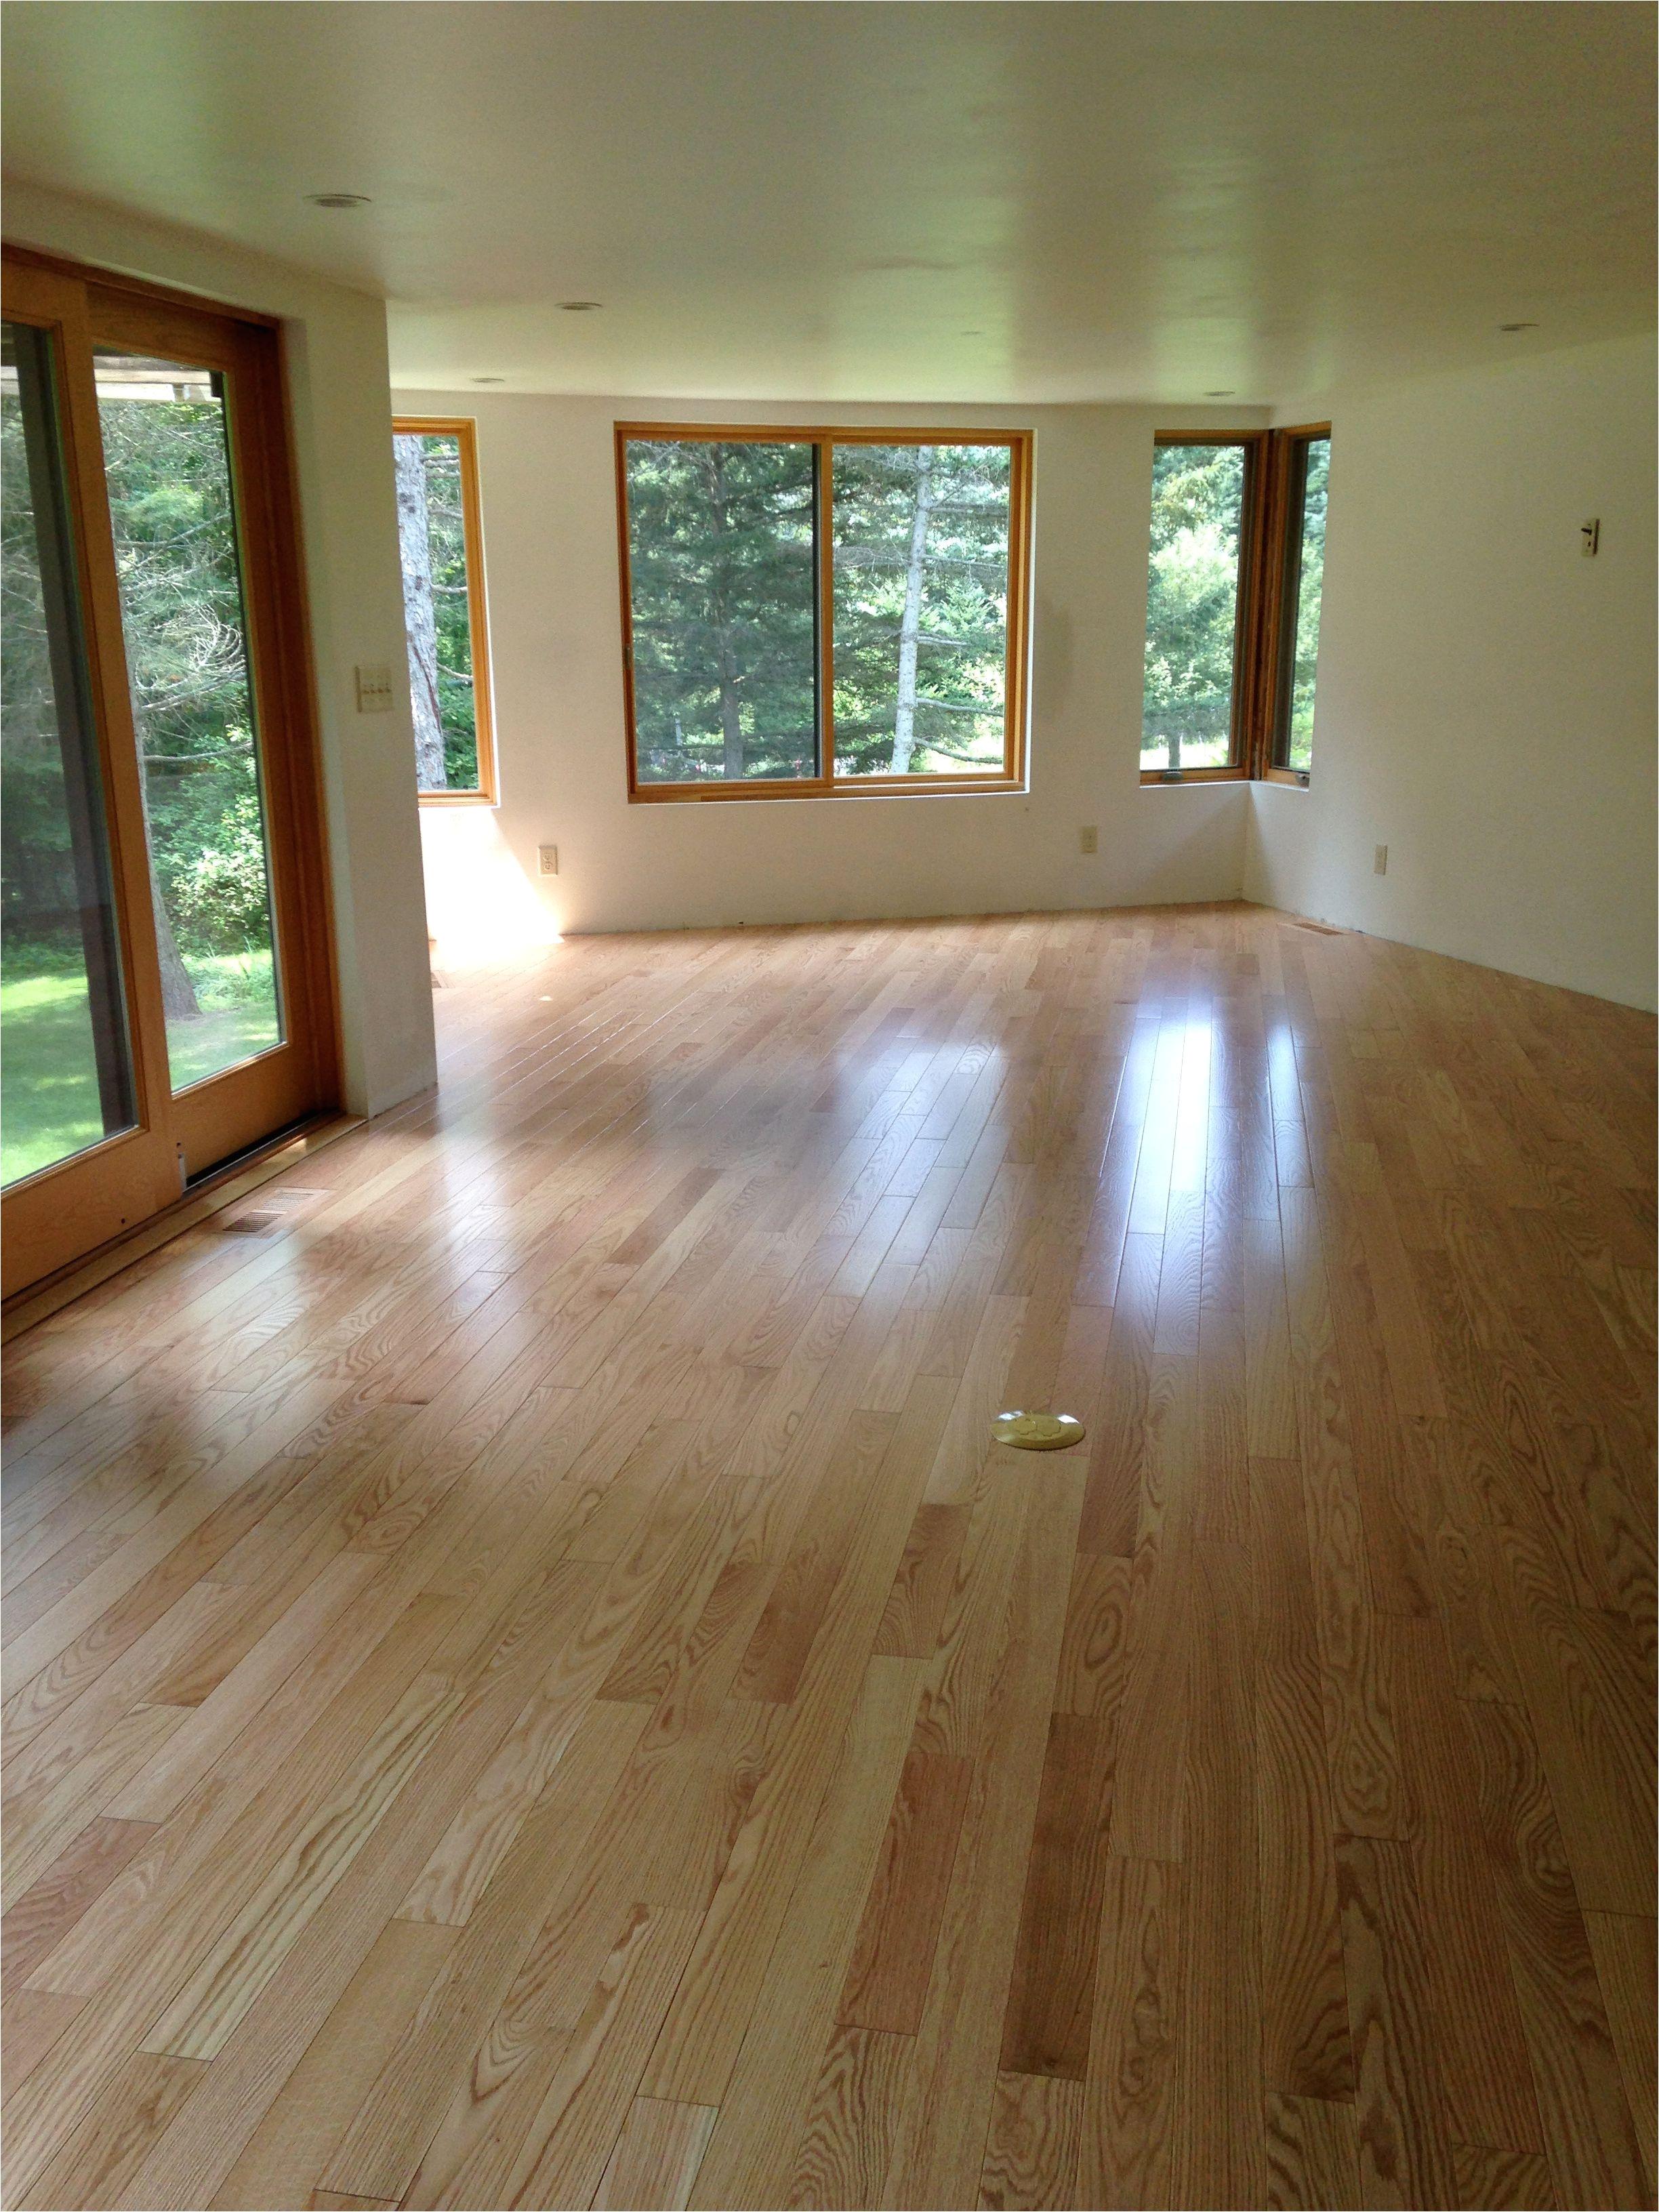 Hardwood Flooring Refinishing Colorado Springs Great Methods to Use for Refinishing Hardwood Floors Pinterest